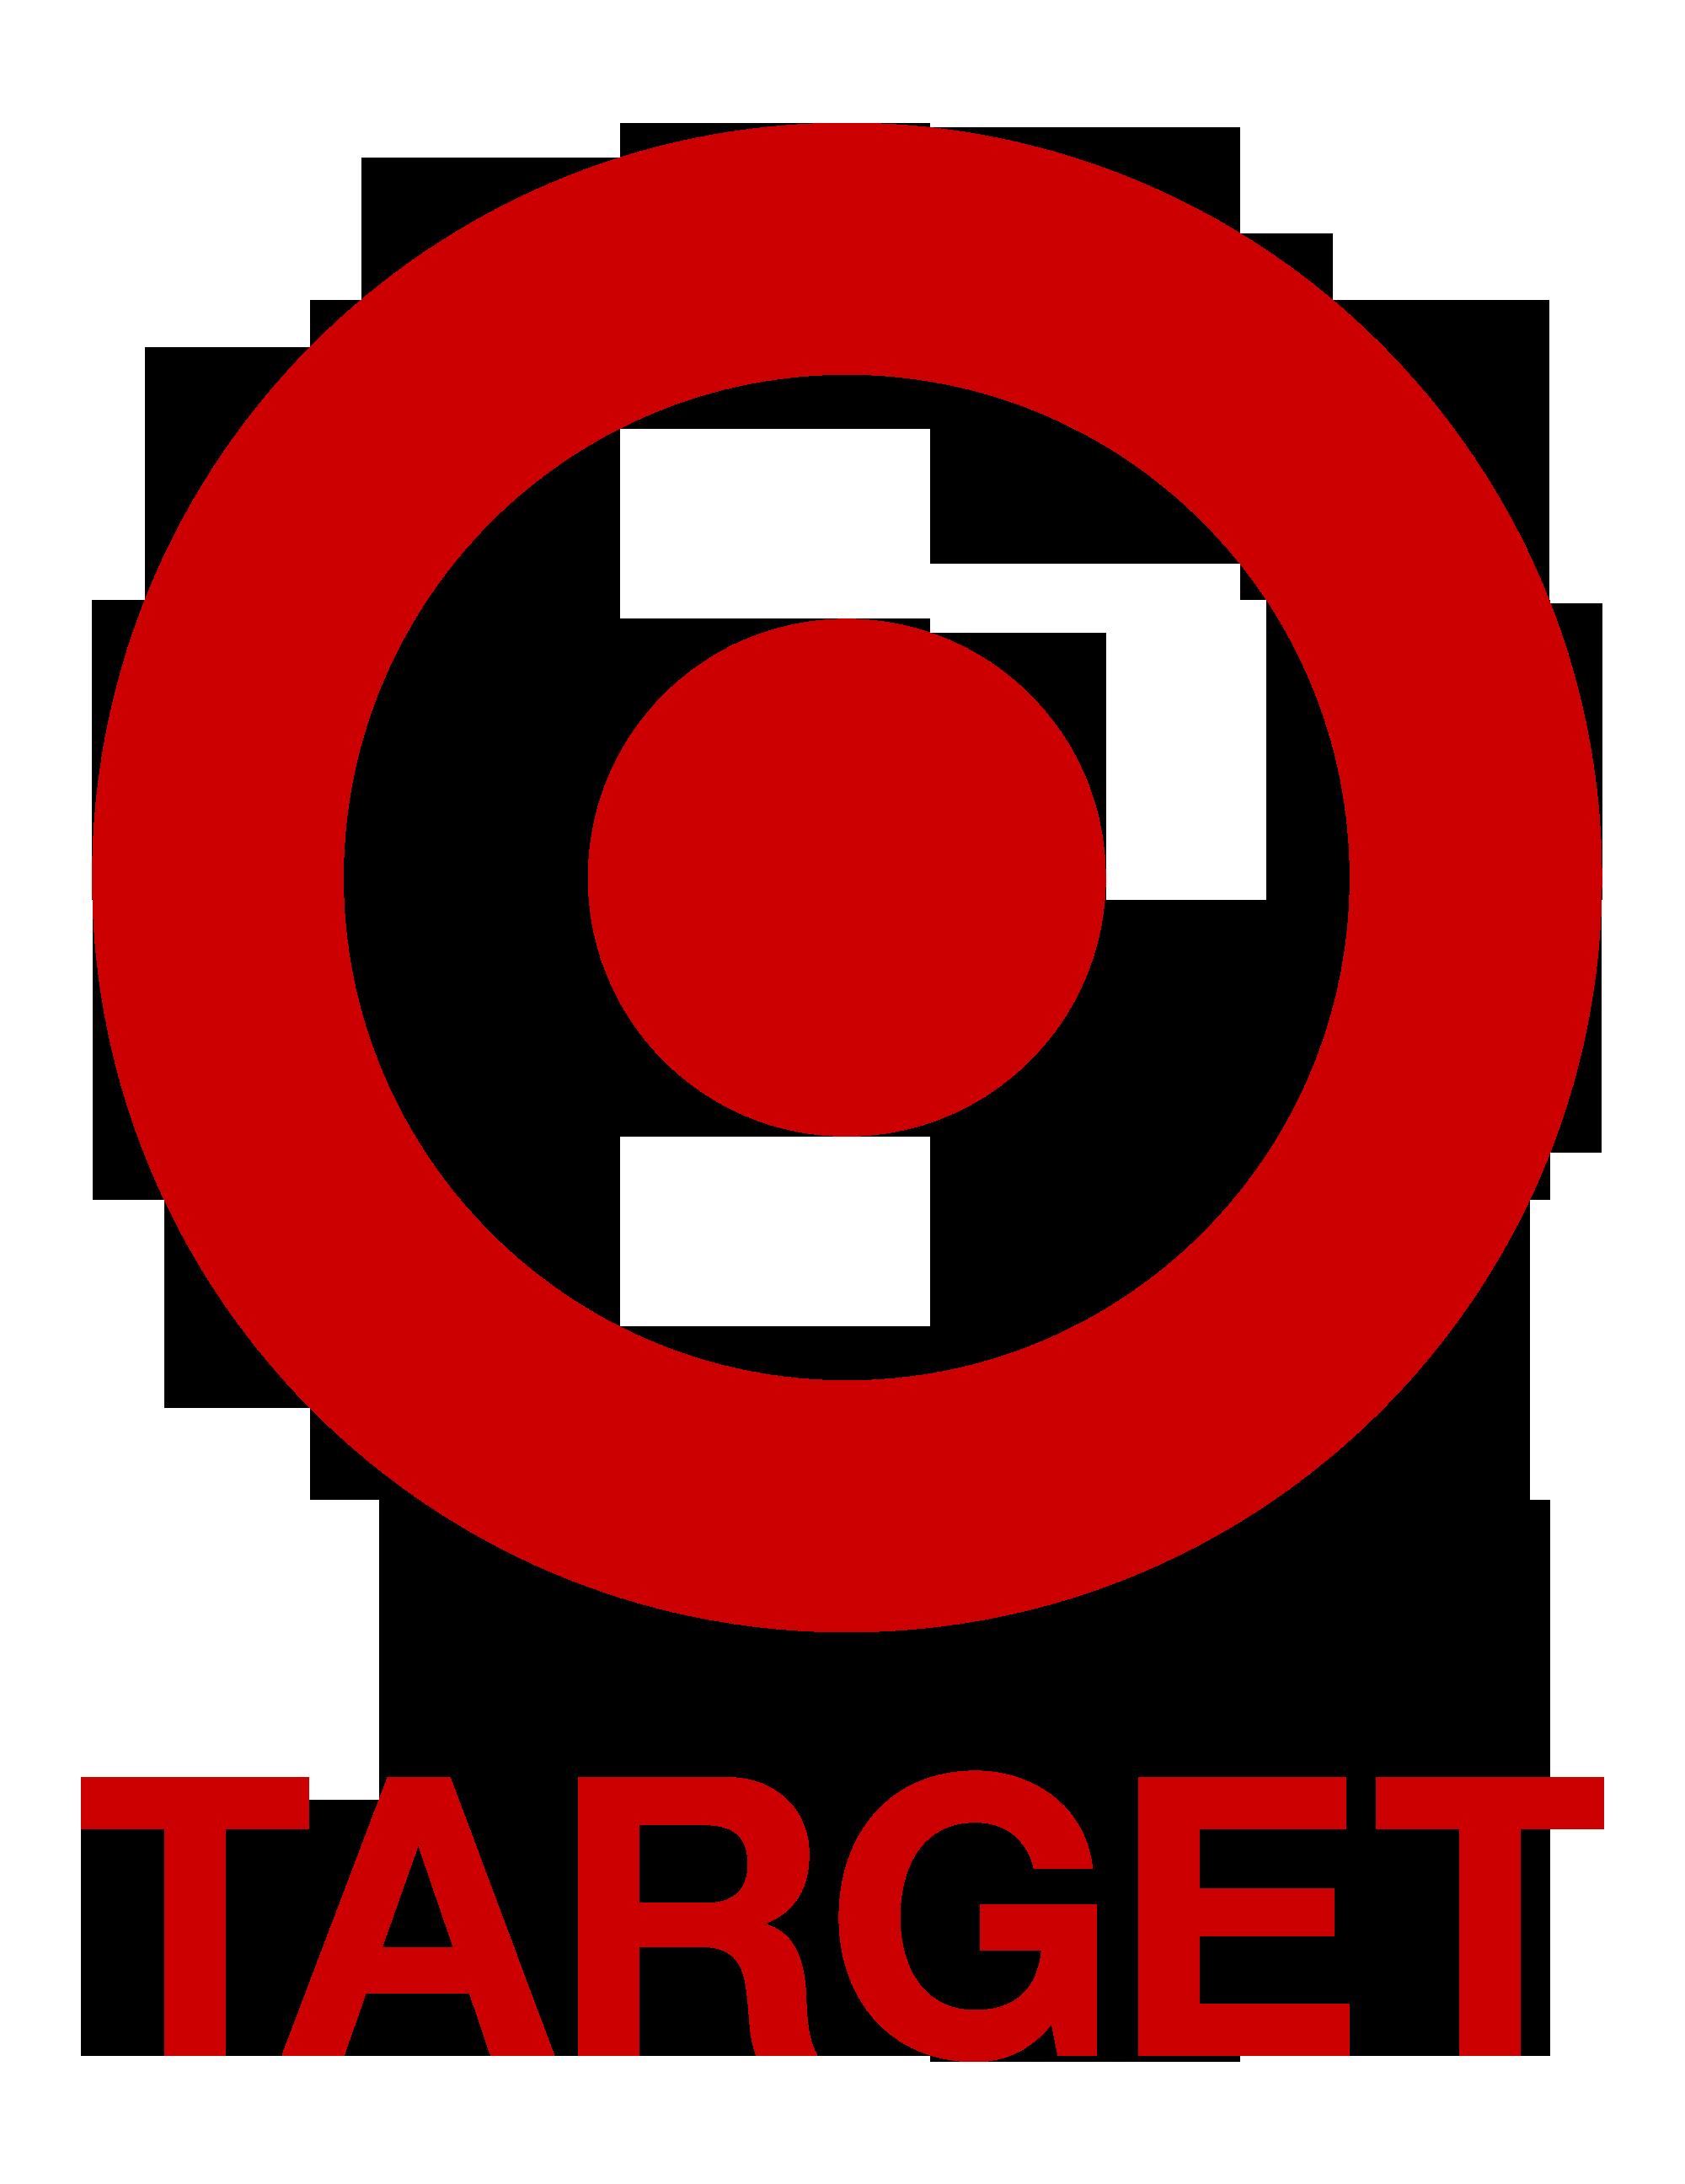 Target Logo Target Target Cupones Tarjetas Personales Creativas